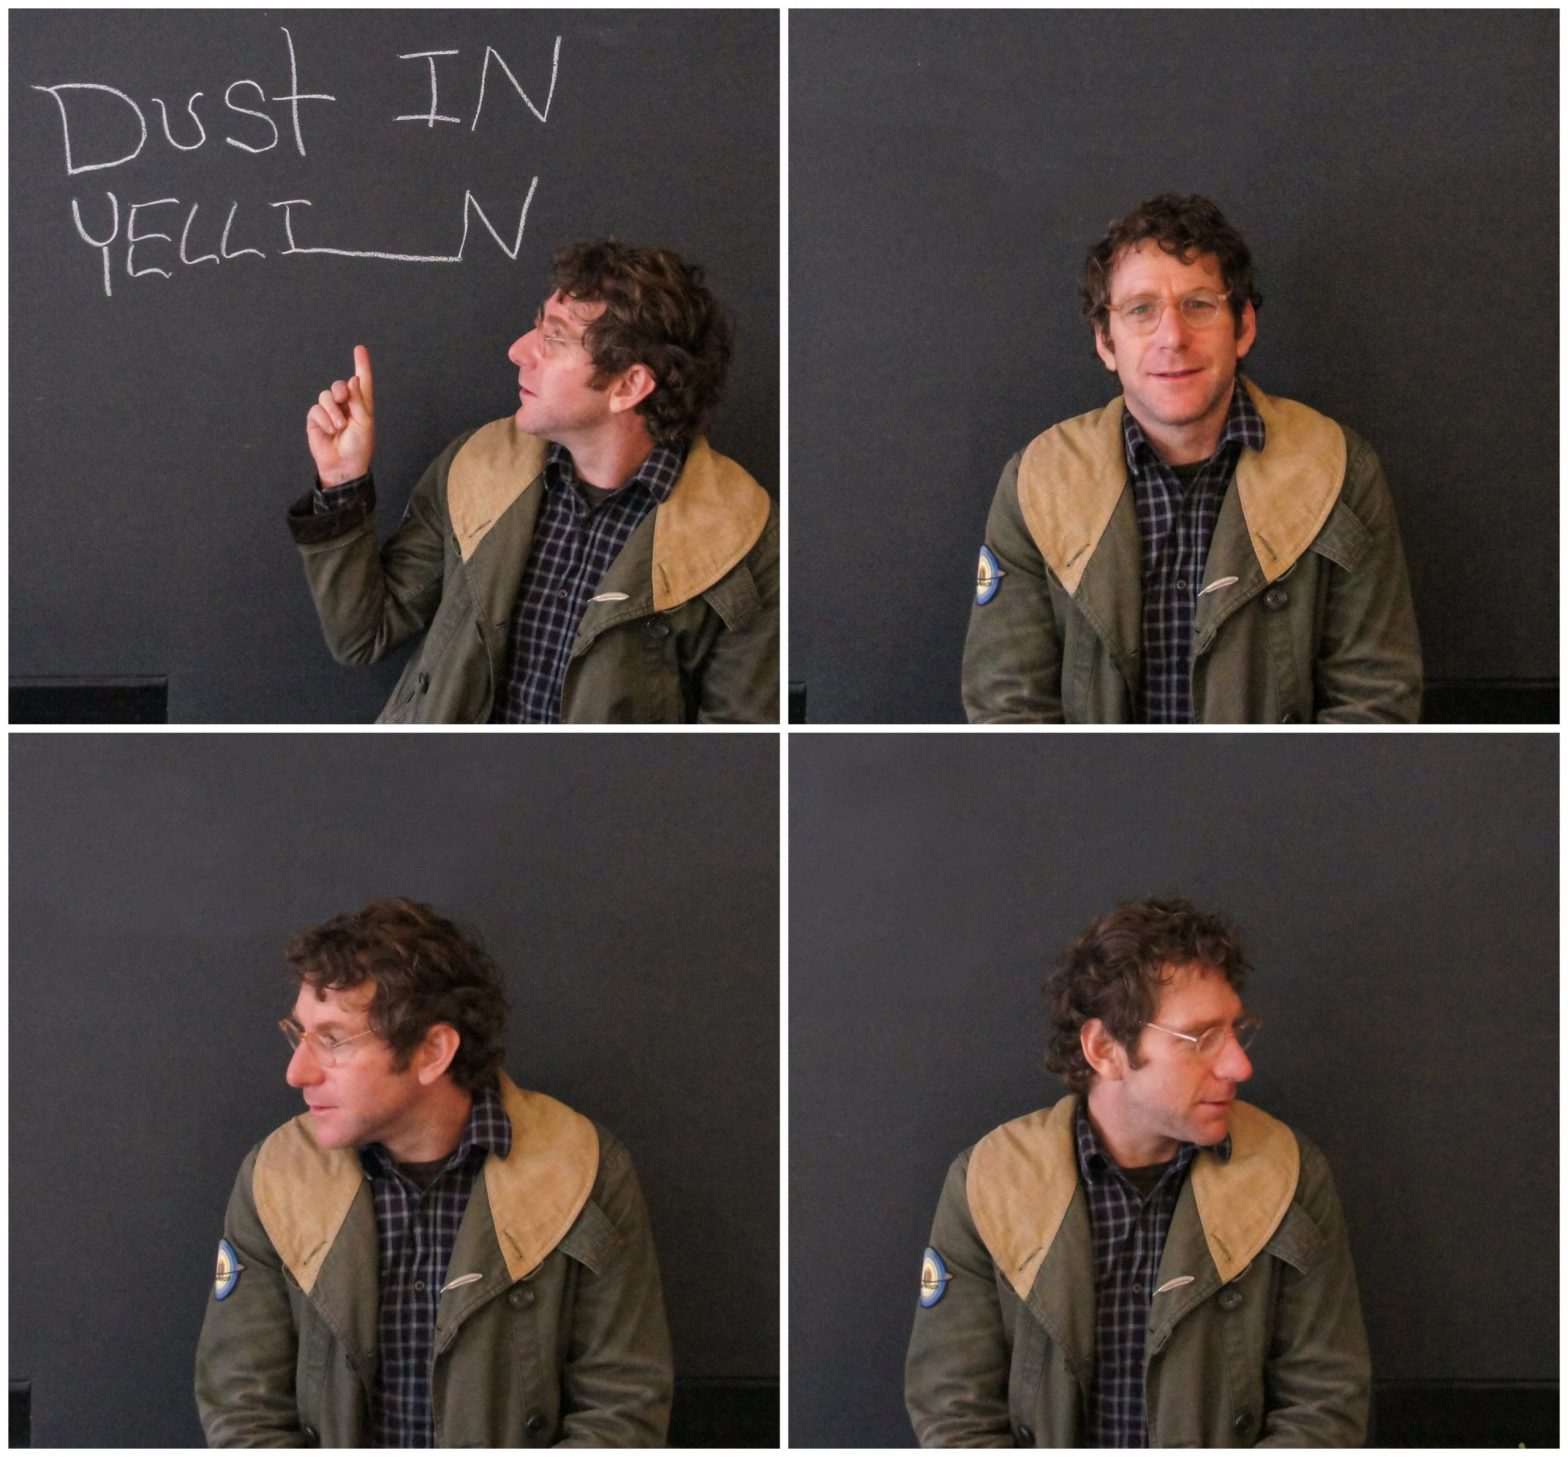 Thumbnail for Dustin Yellin